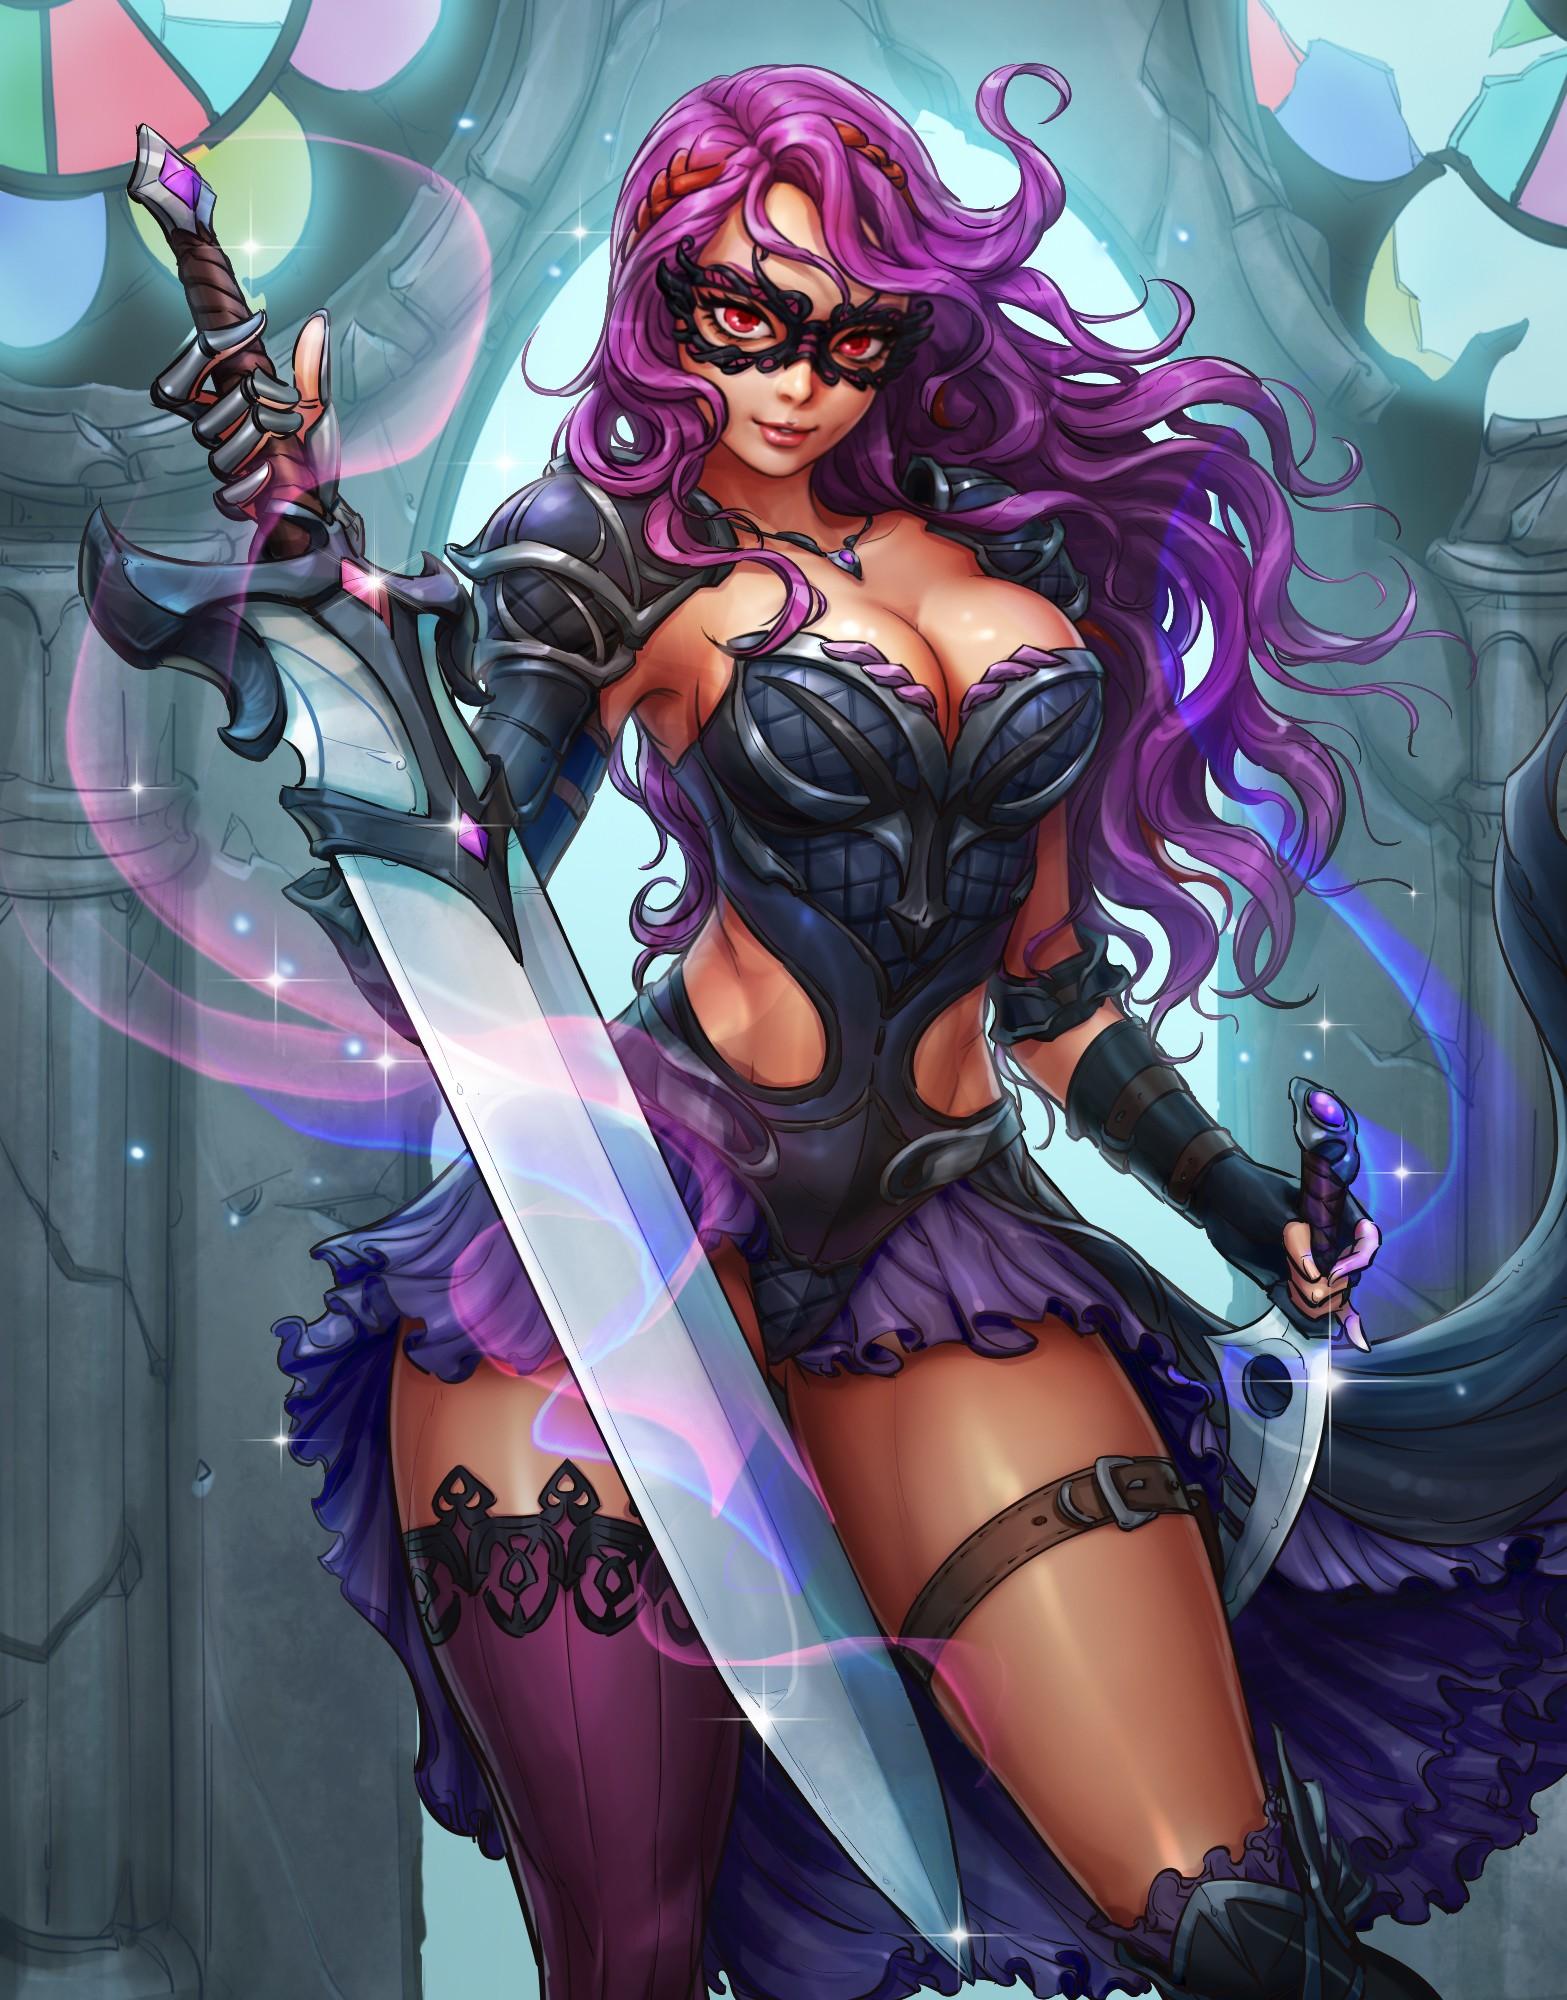 Gilr with purple hair with big boobs Warrior Big Boobs Purple Hair Red Eyes Fantasy Girl Spiritstones Anime Girls Anime Sword Mask Fantasy Art 1567x2000 Wallpaper Wallhaven Cc